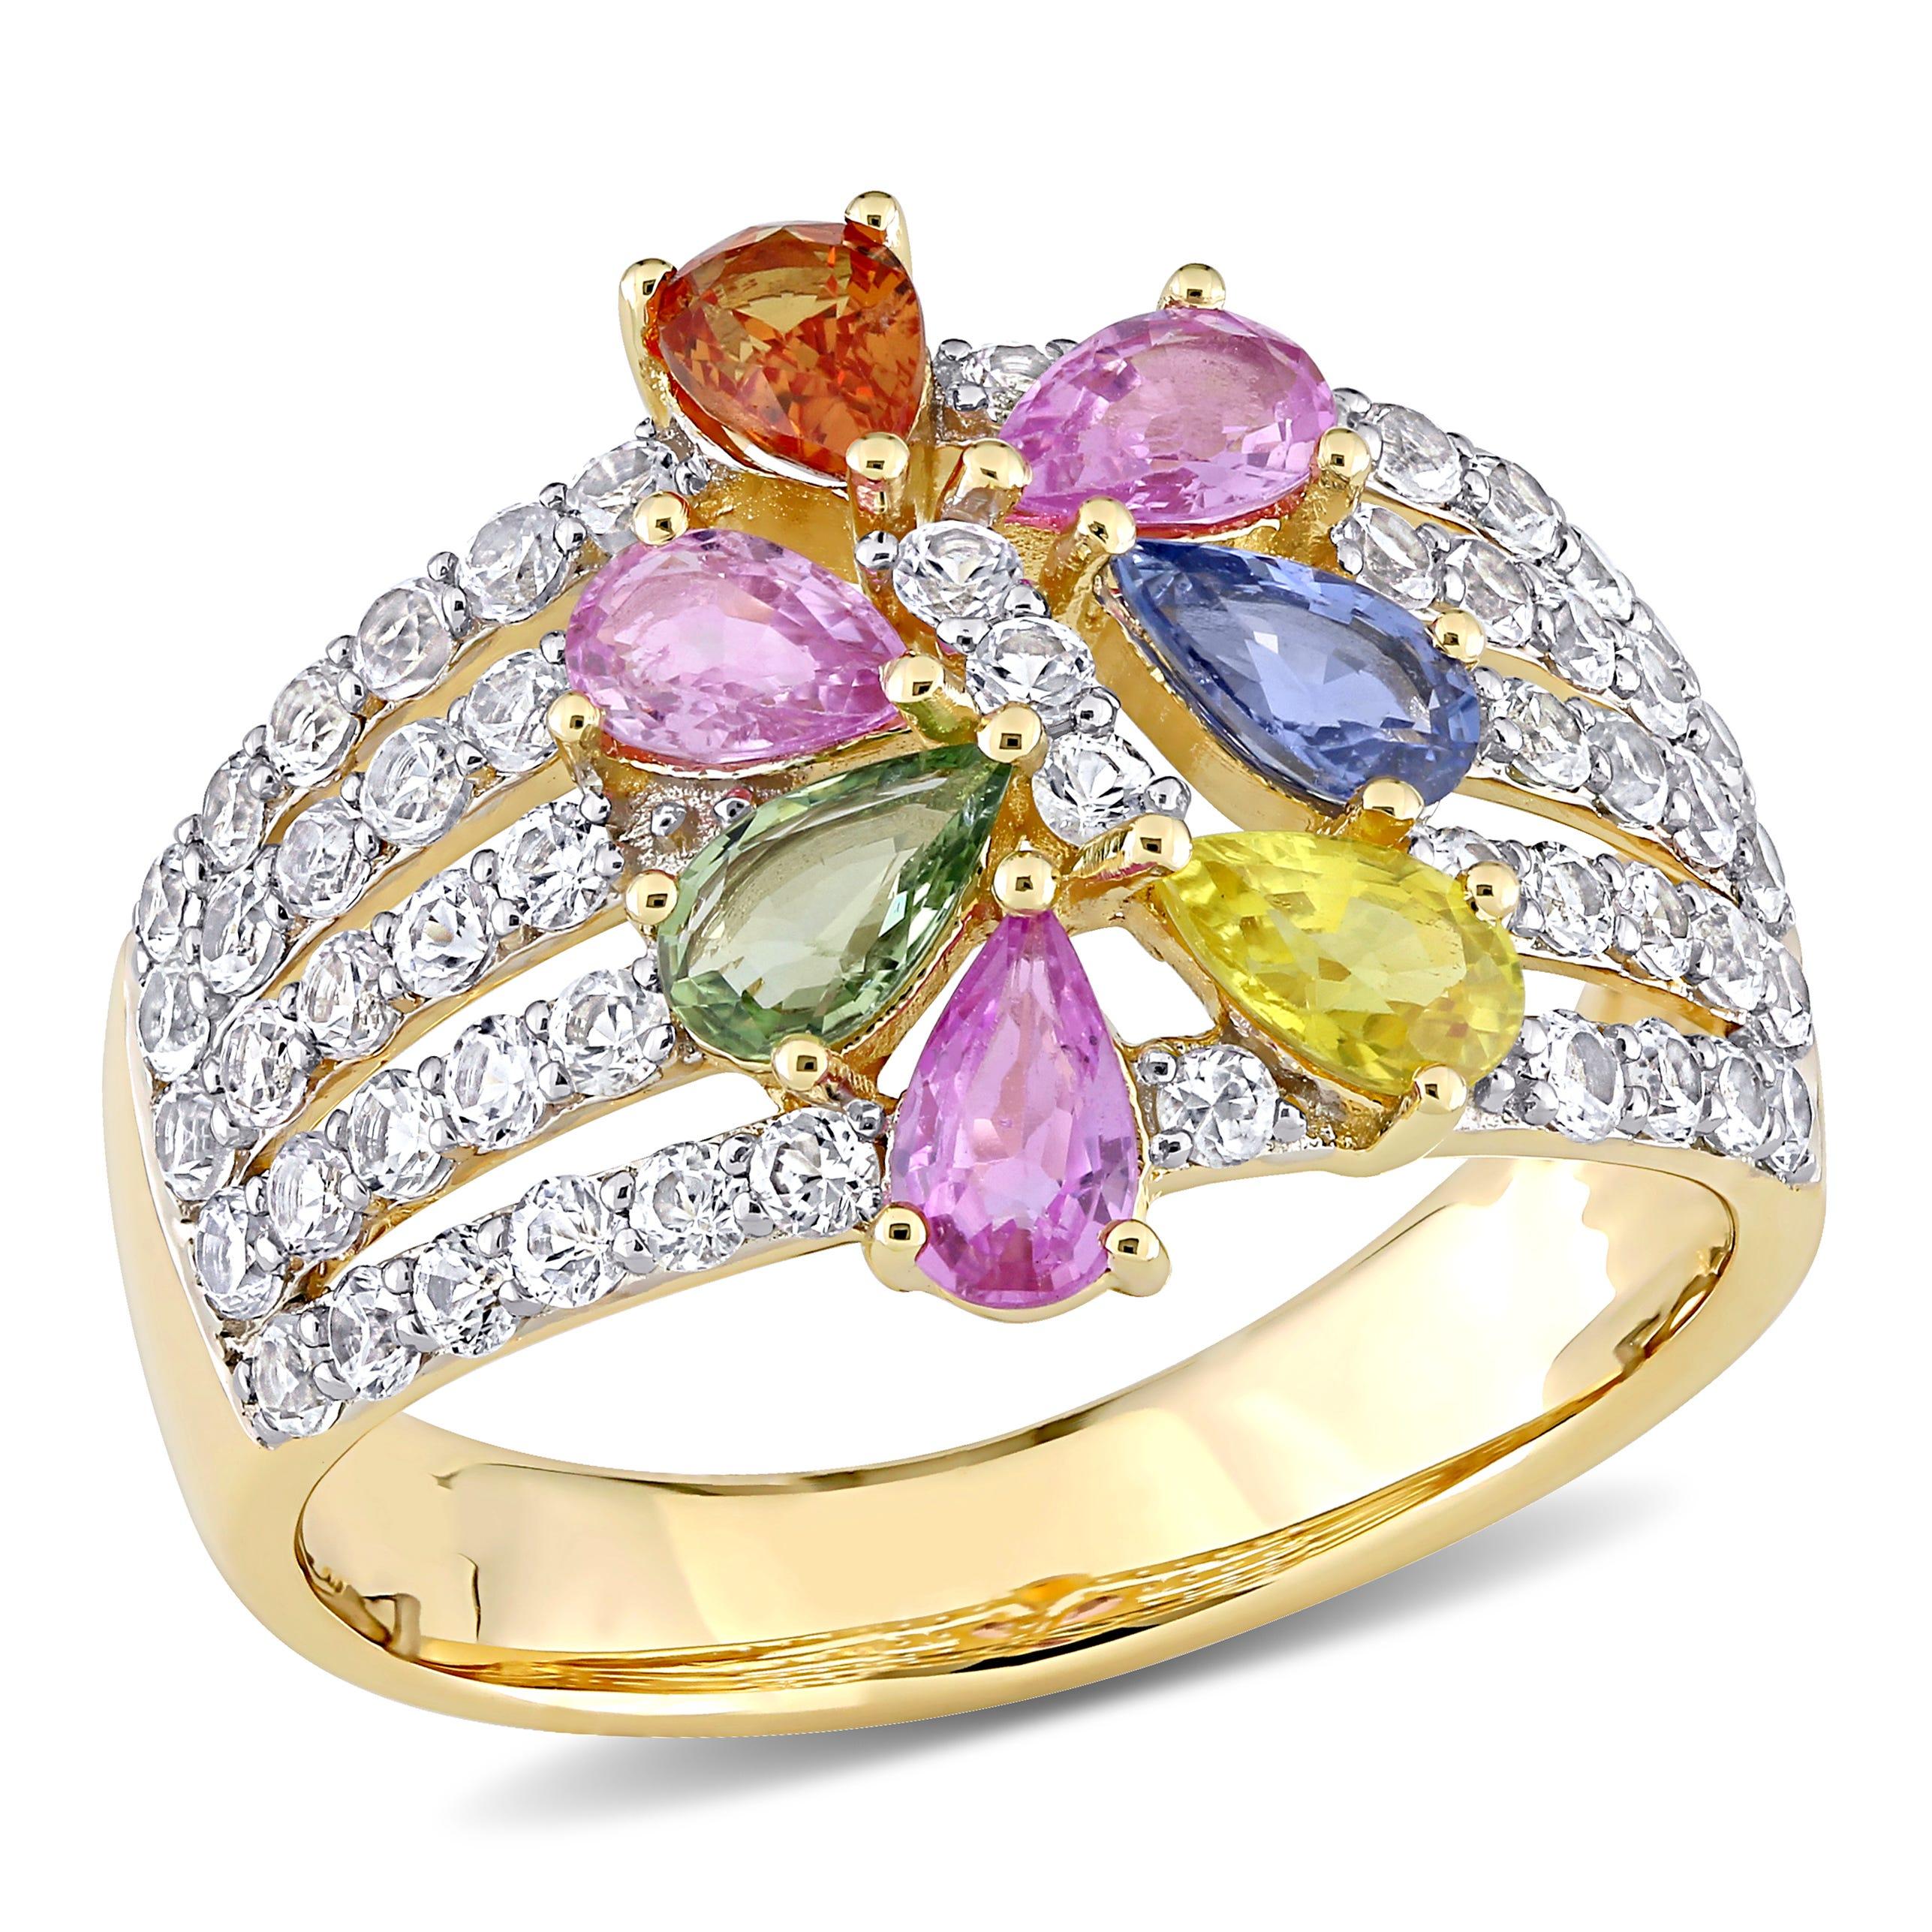 Rainbow Created Sapphire & Diamond Fashion Ring in 14k Yellow Gold